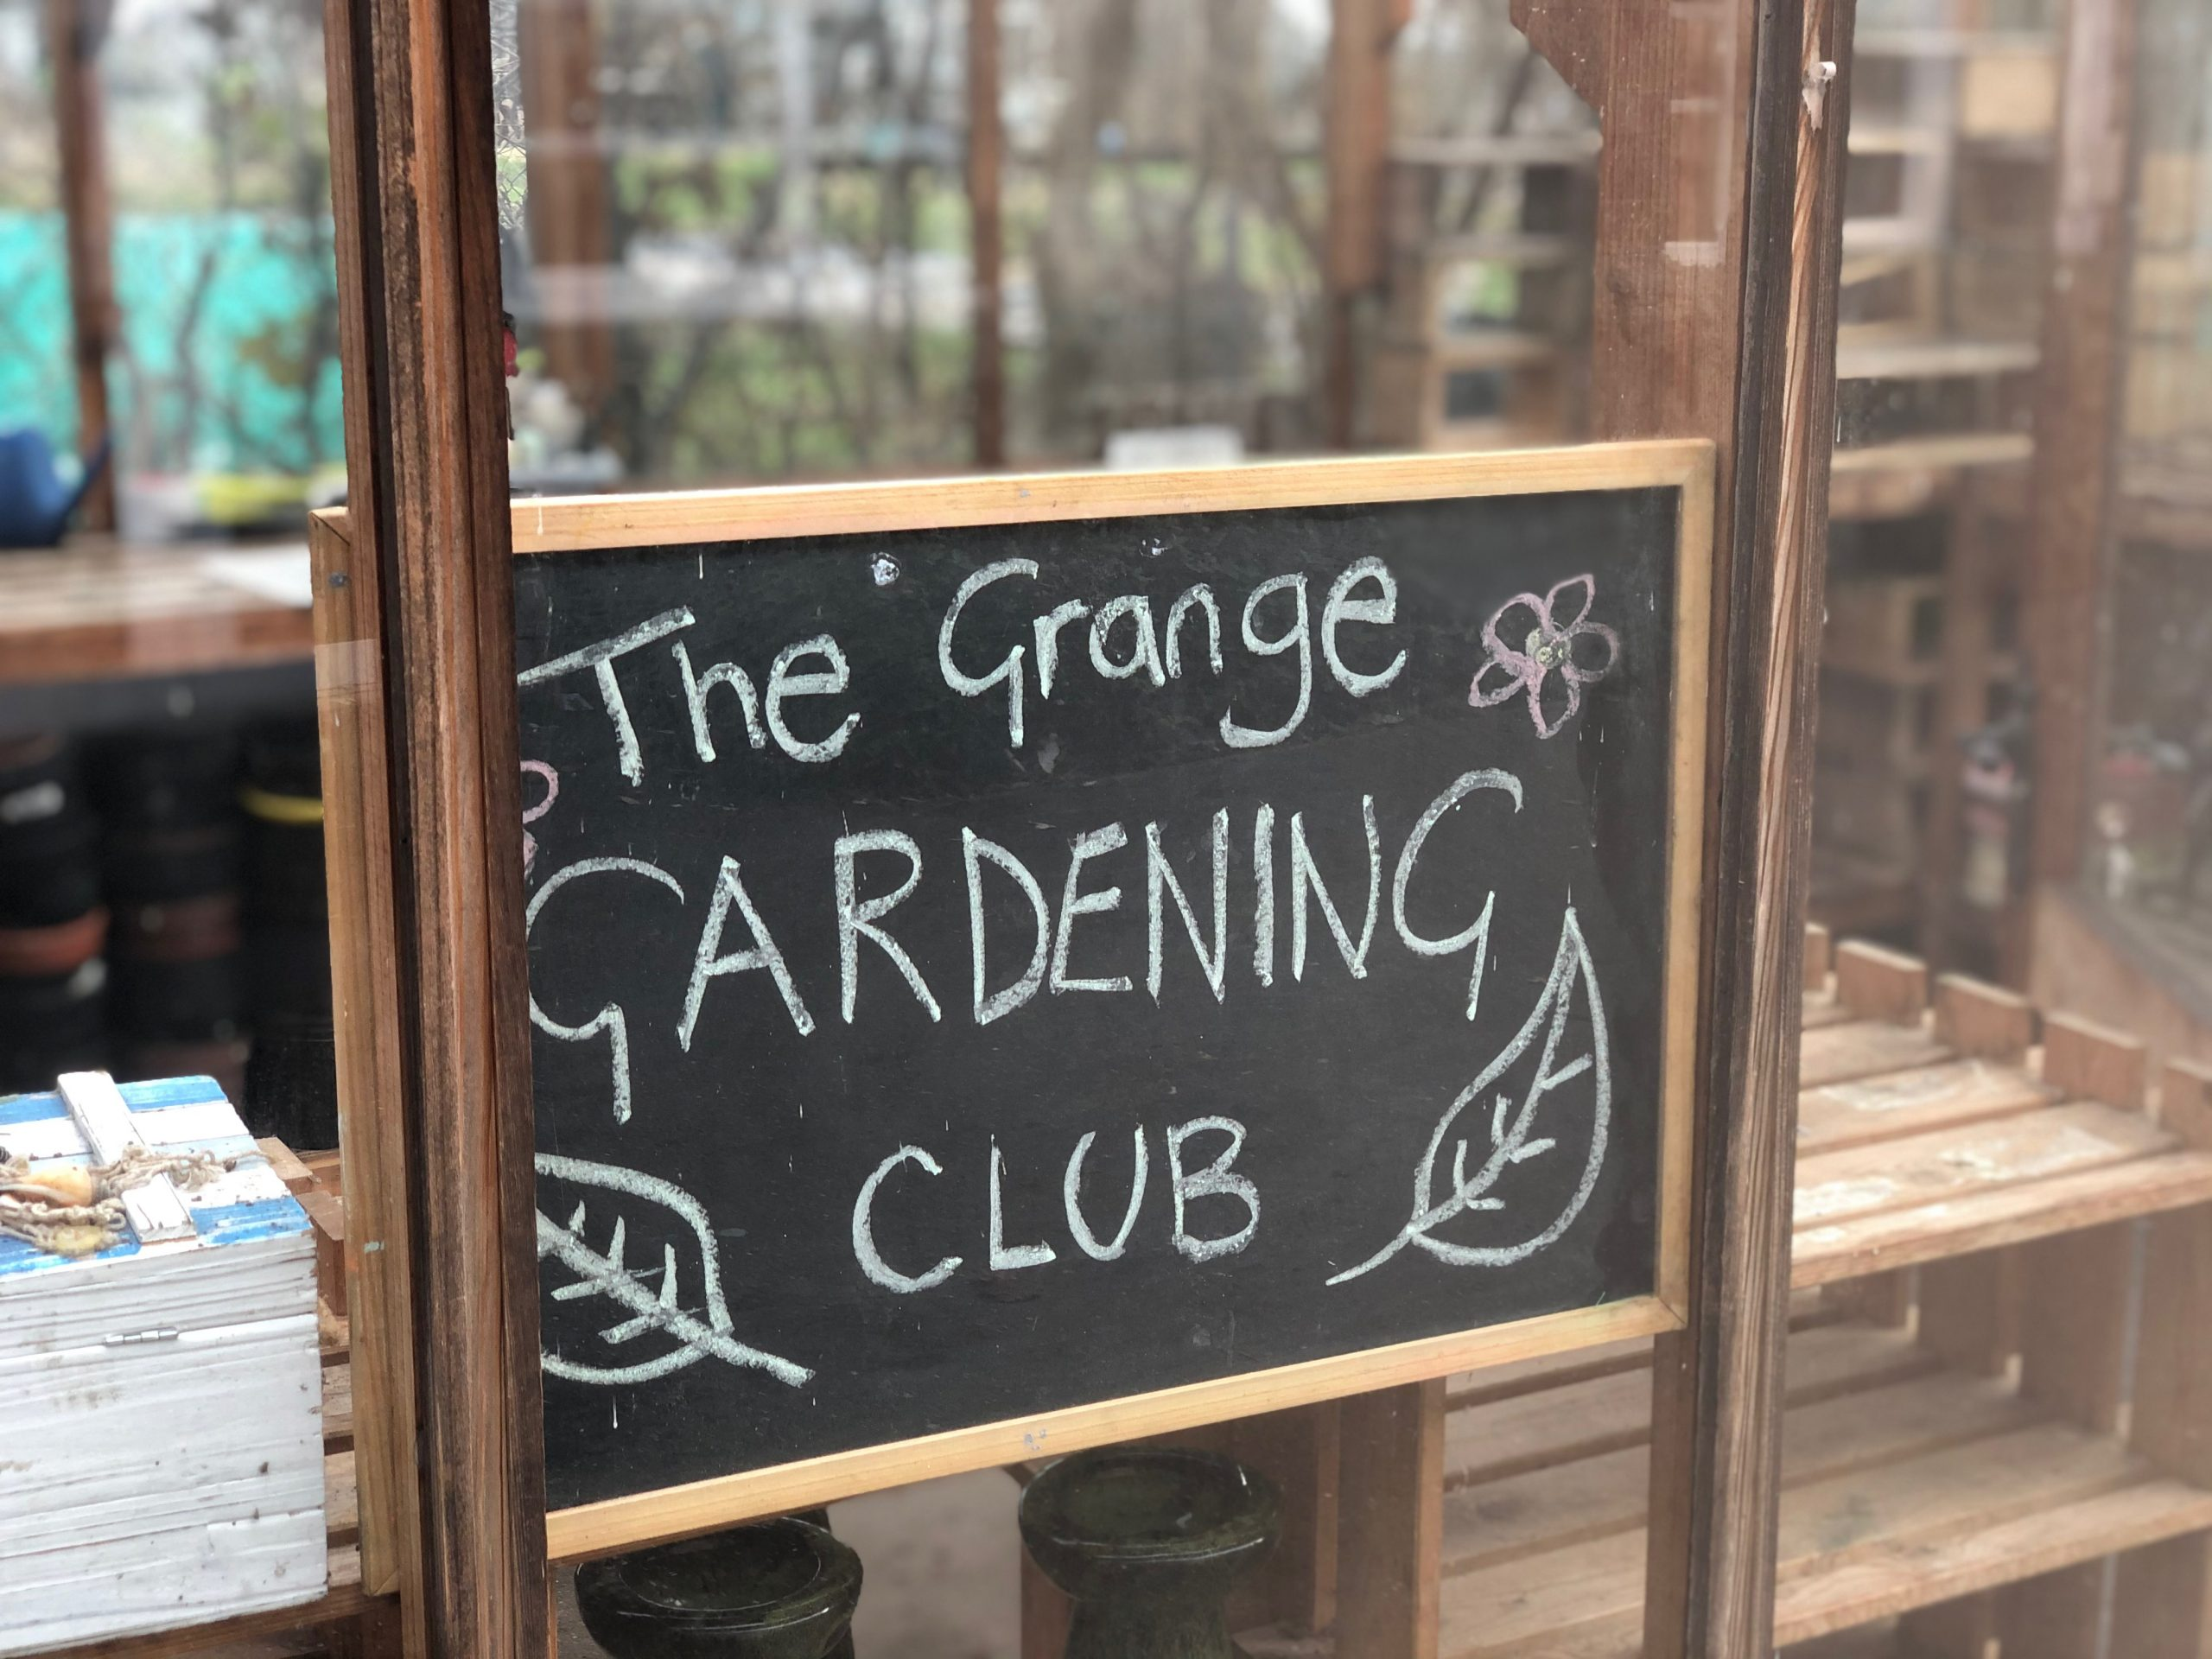 Gardening Club Jan20